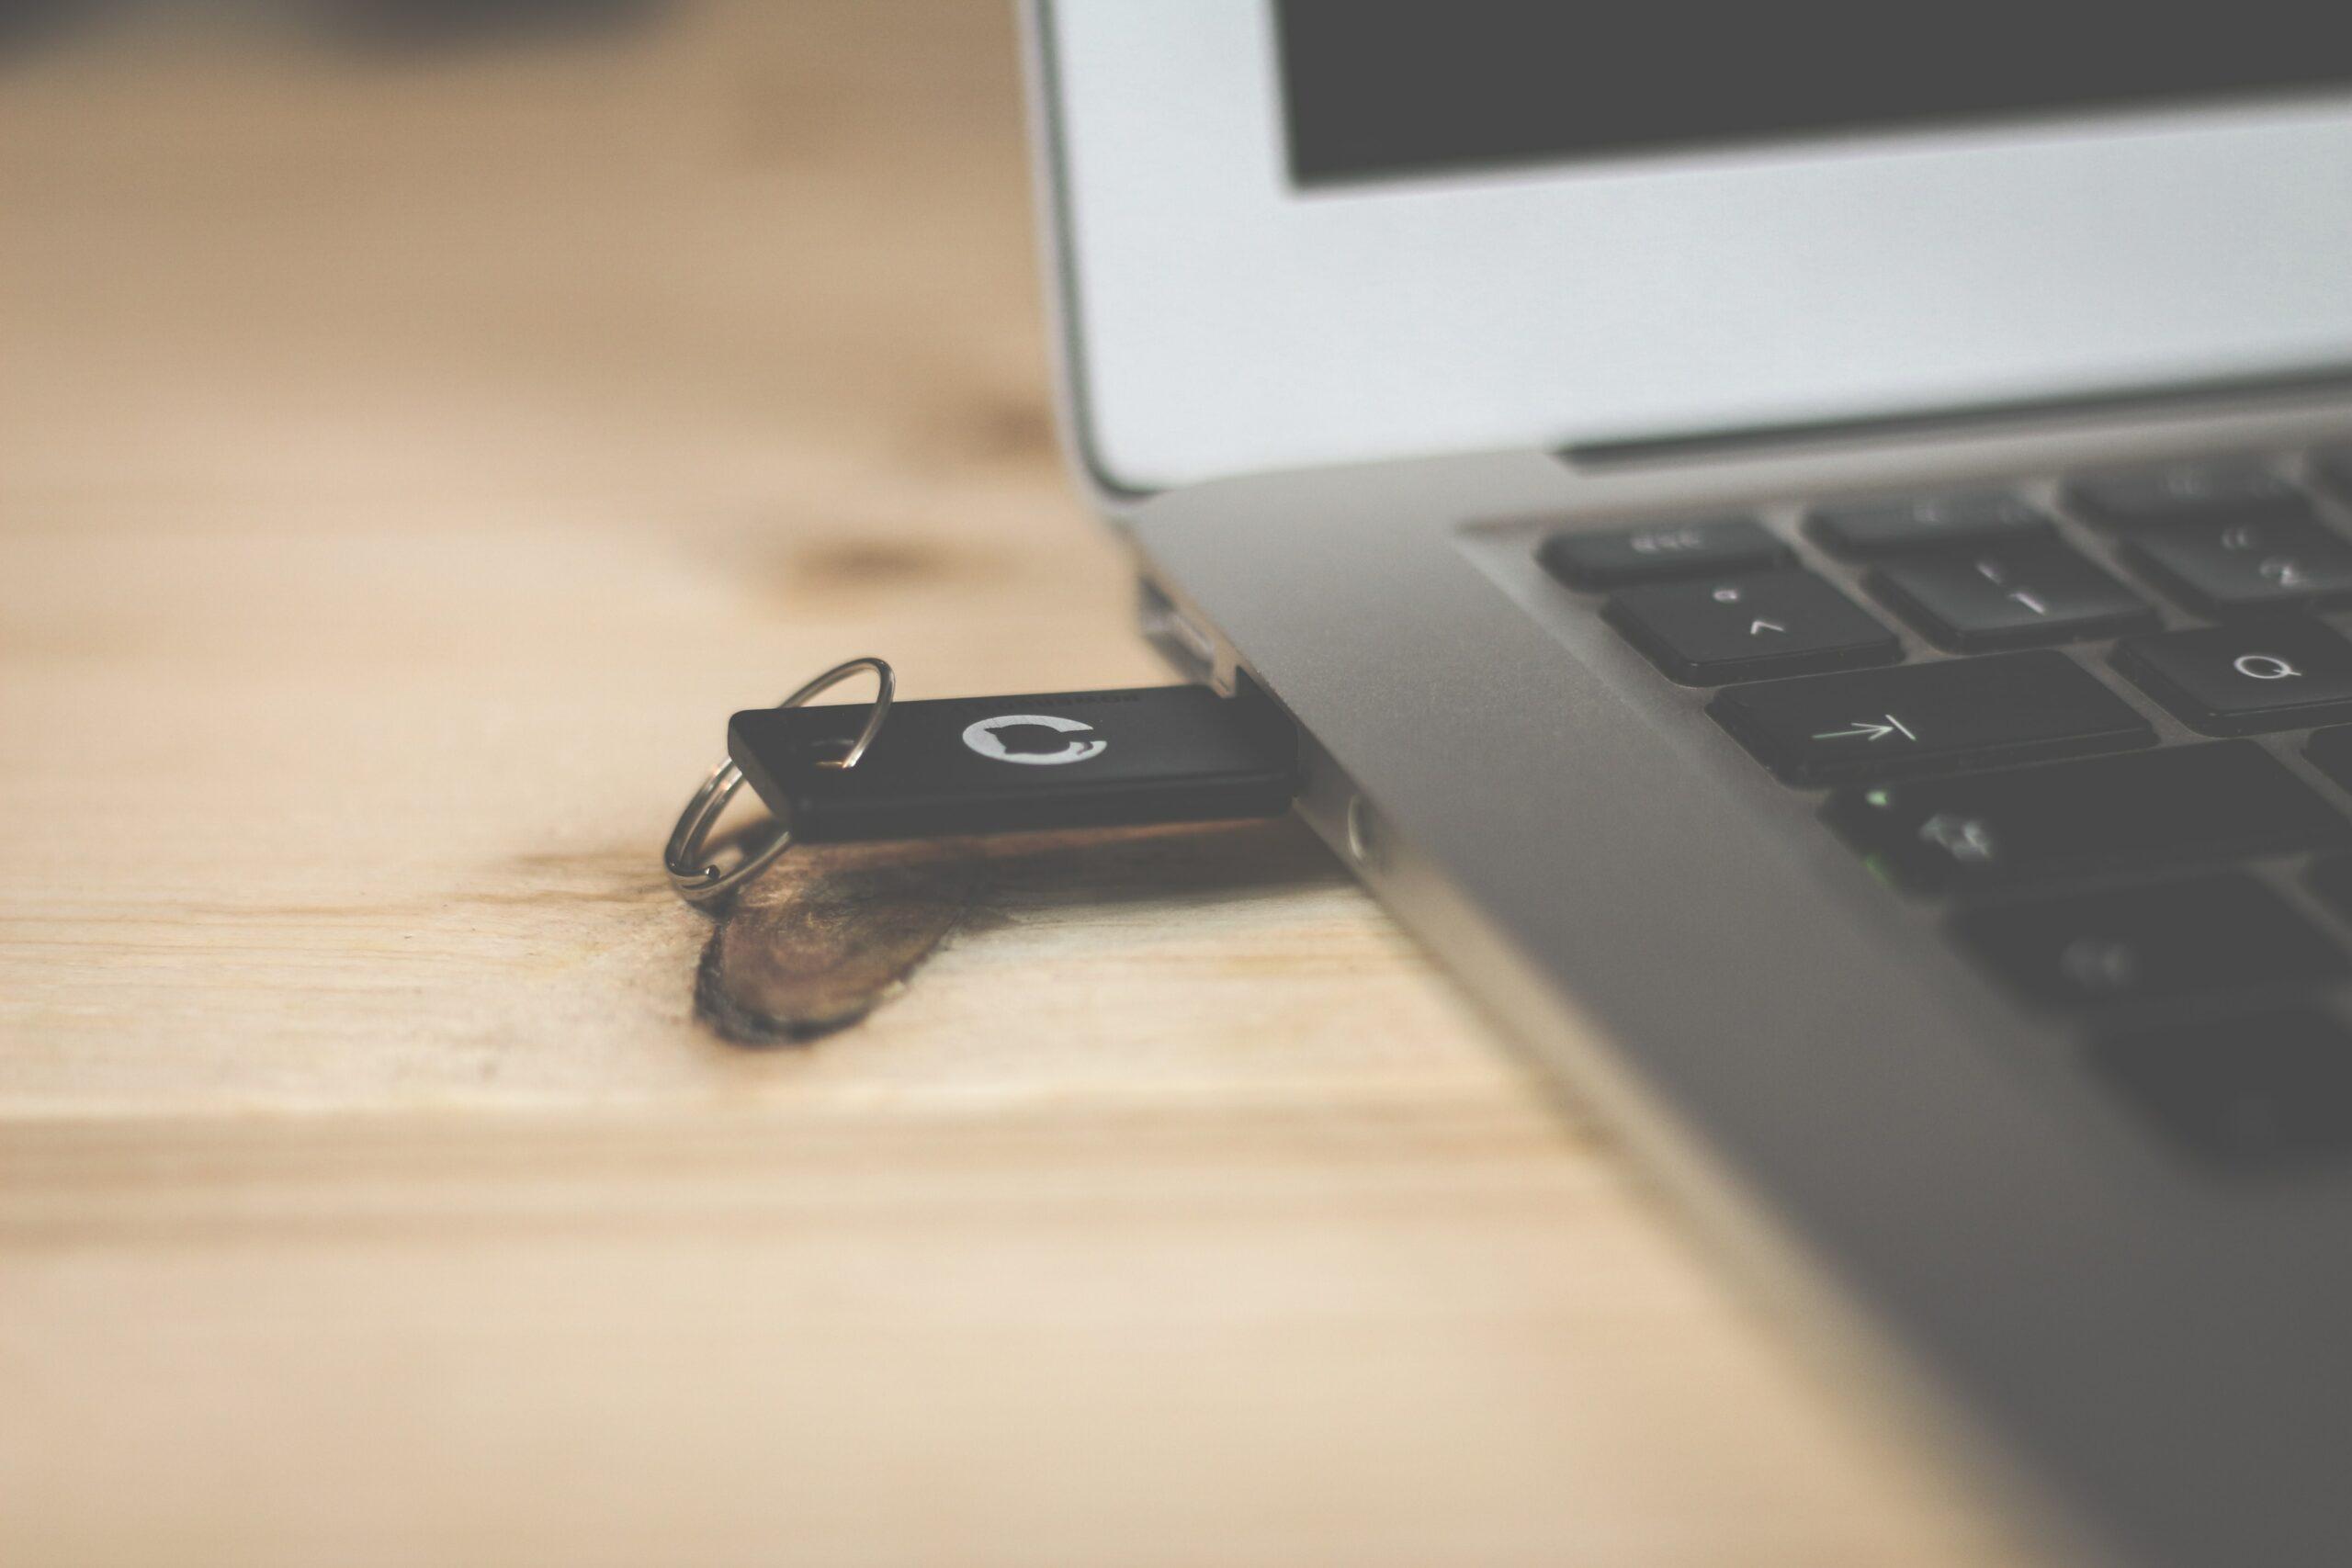 A teacher's flash drive